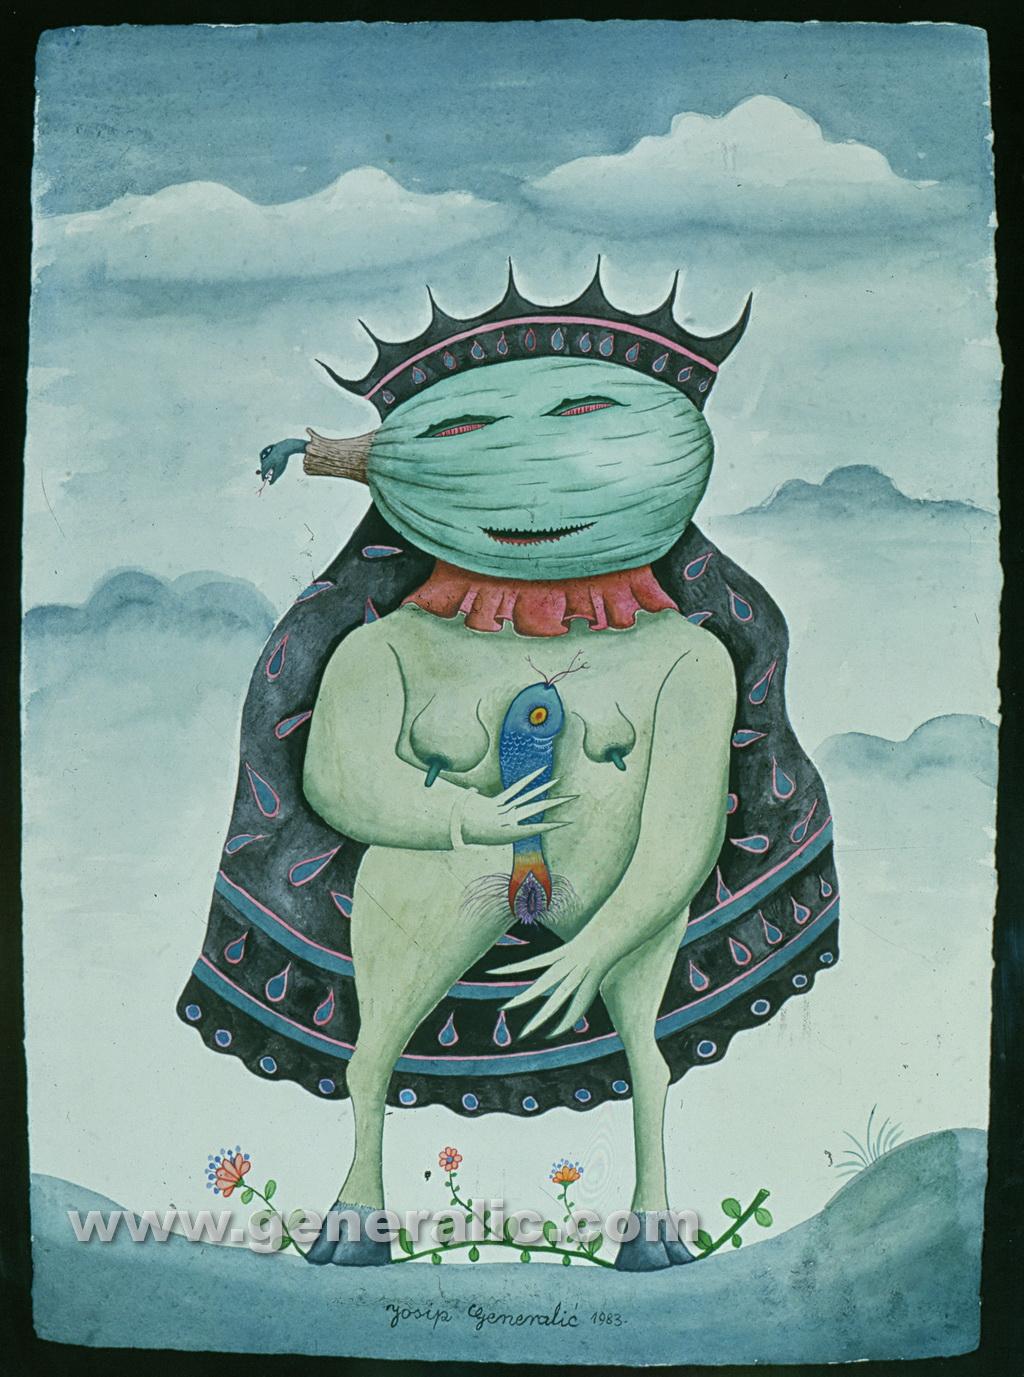 Josip Generalic, 1983, Devil's bride, watercolour